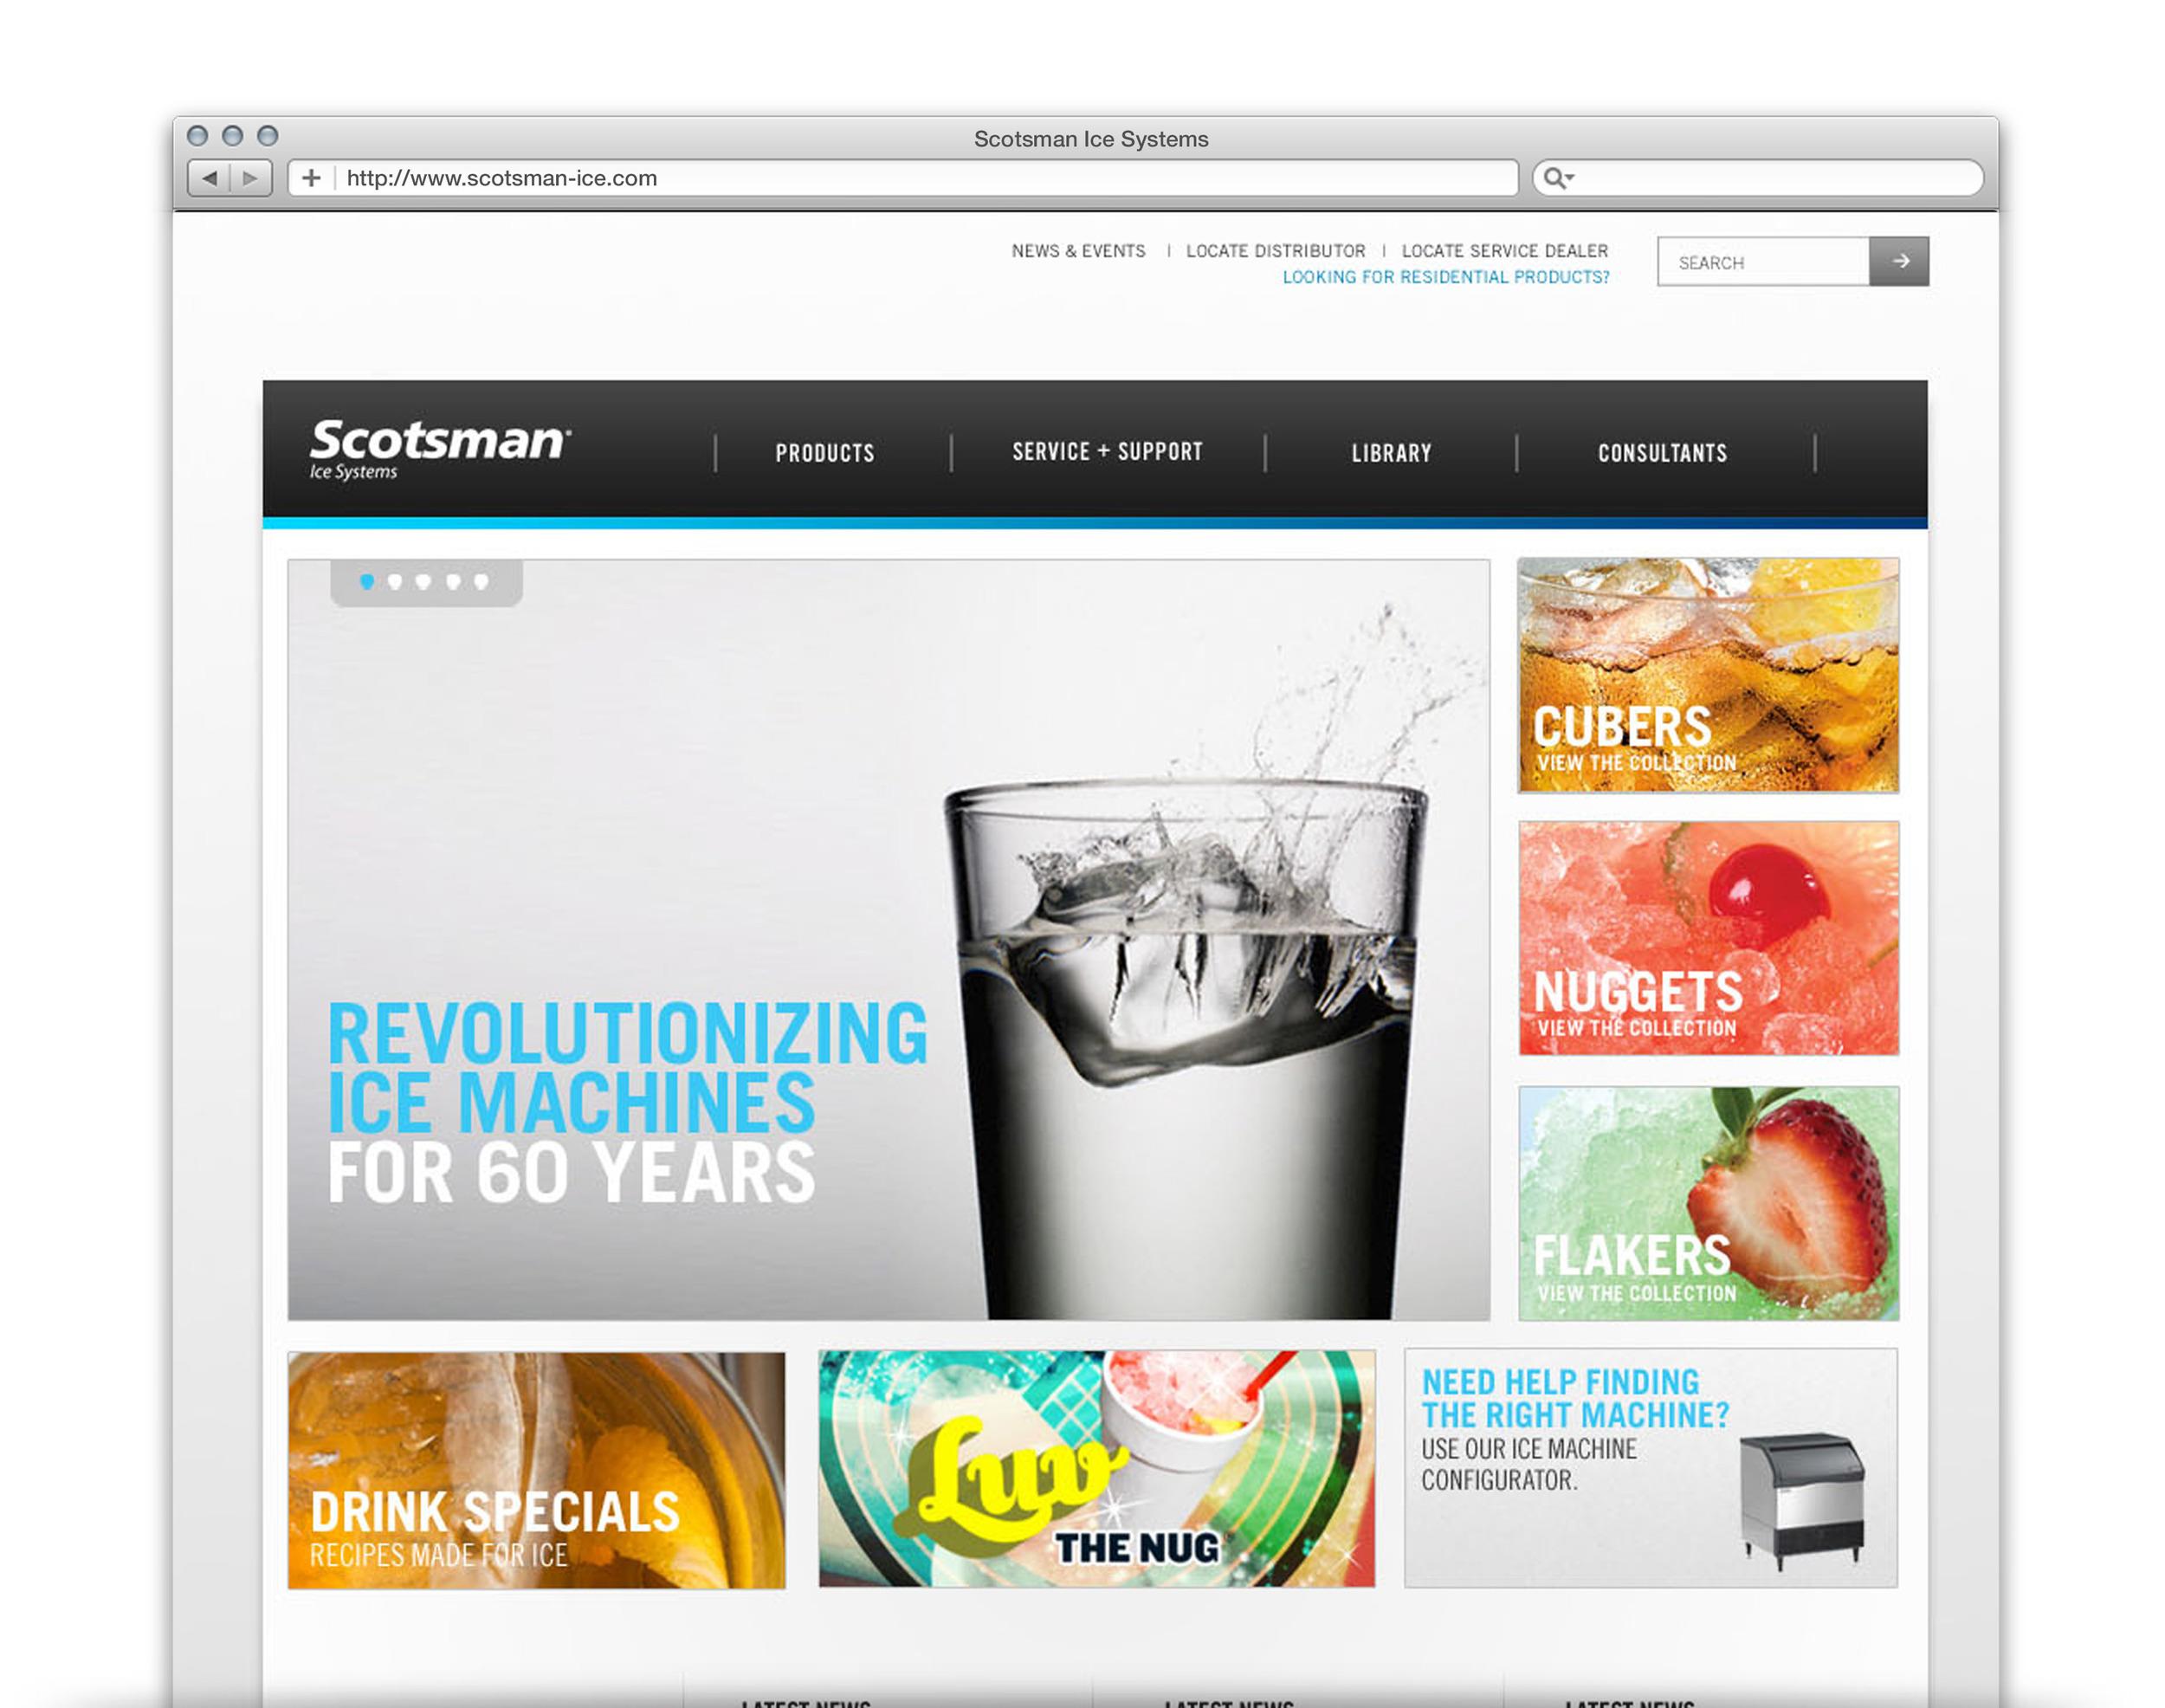 Scotsman Ice Corporate Site - UX + UI Design